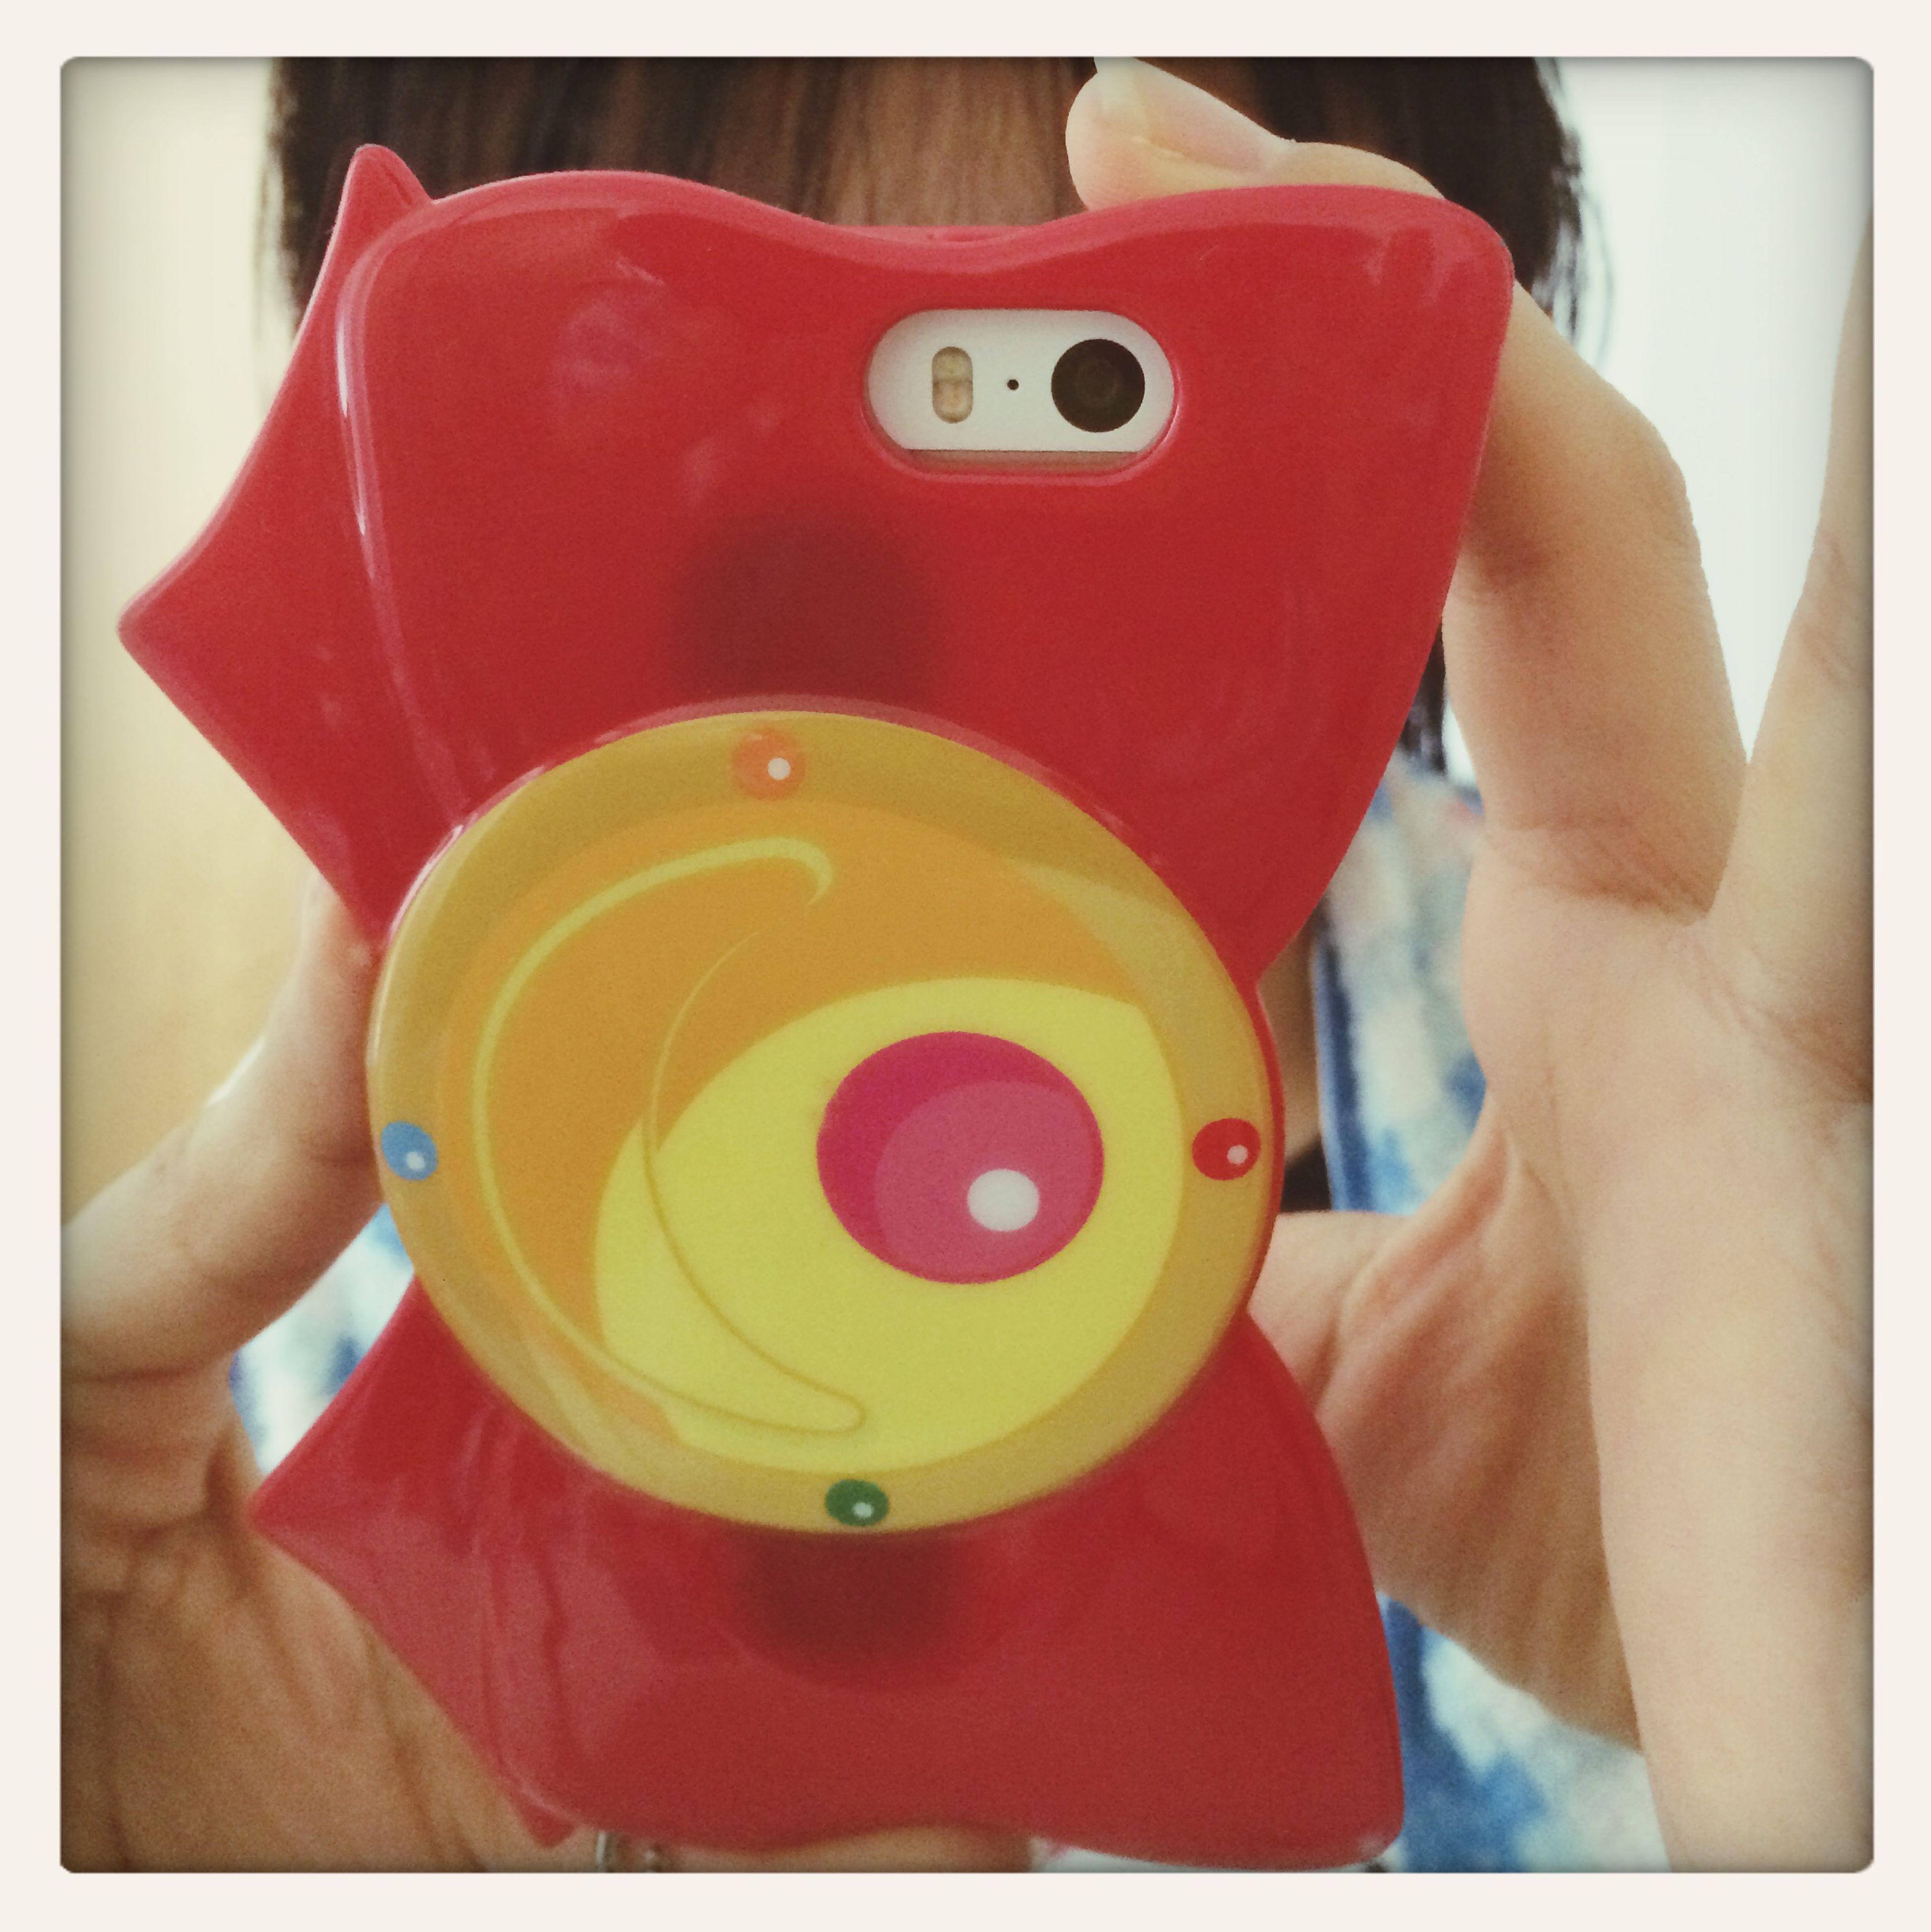 My iPhone Case??? Sailor Moon Iphone Case First - EyeEm - 웹